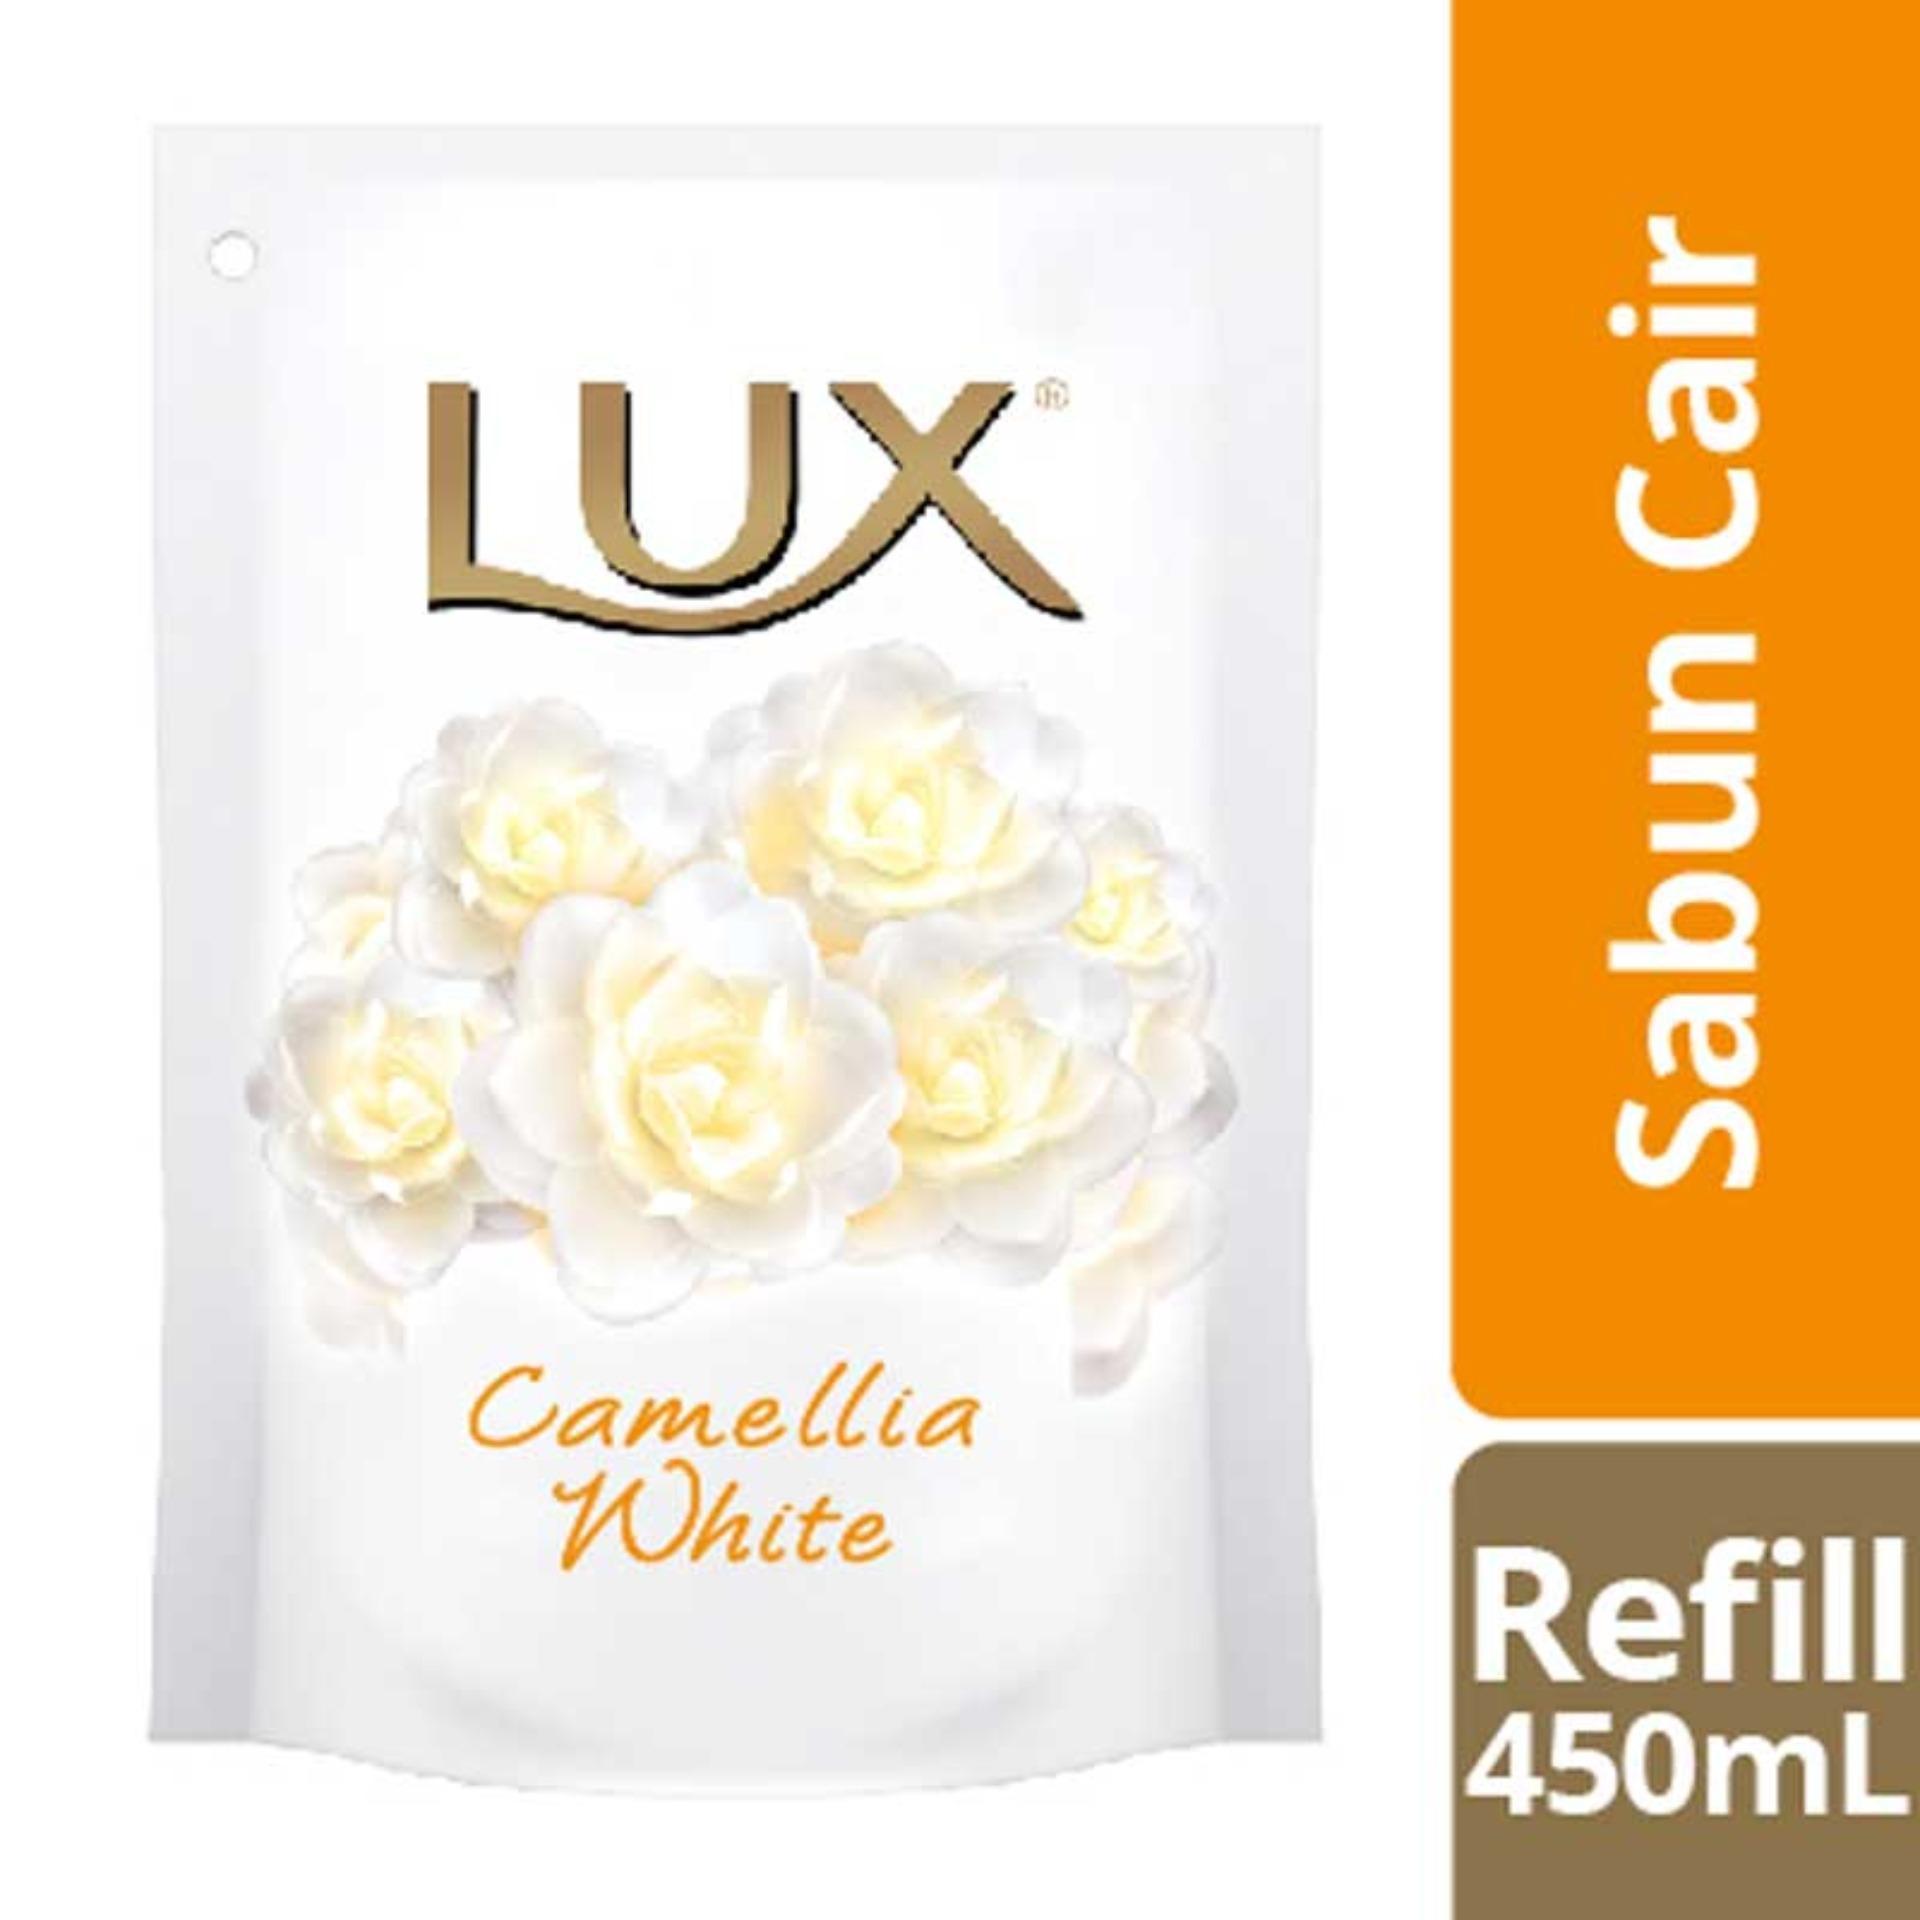 Lux Jual Produk Terbaik Sabun Rose Kecil Herbal Body Wash White Impress Refill 450ml